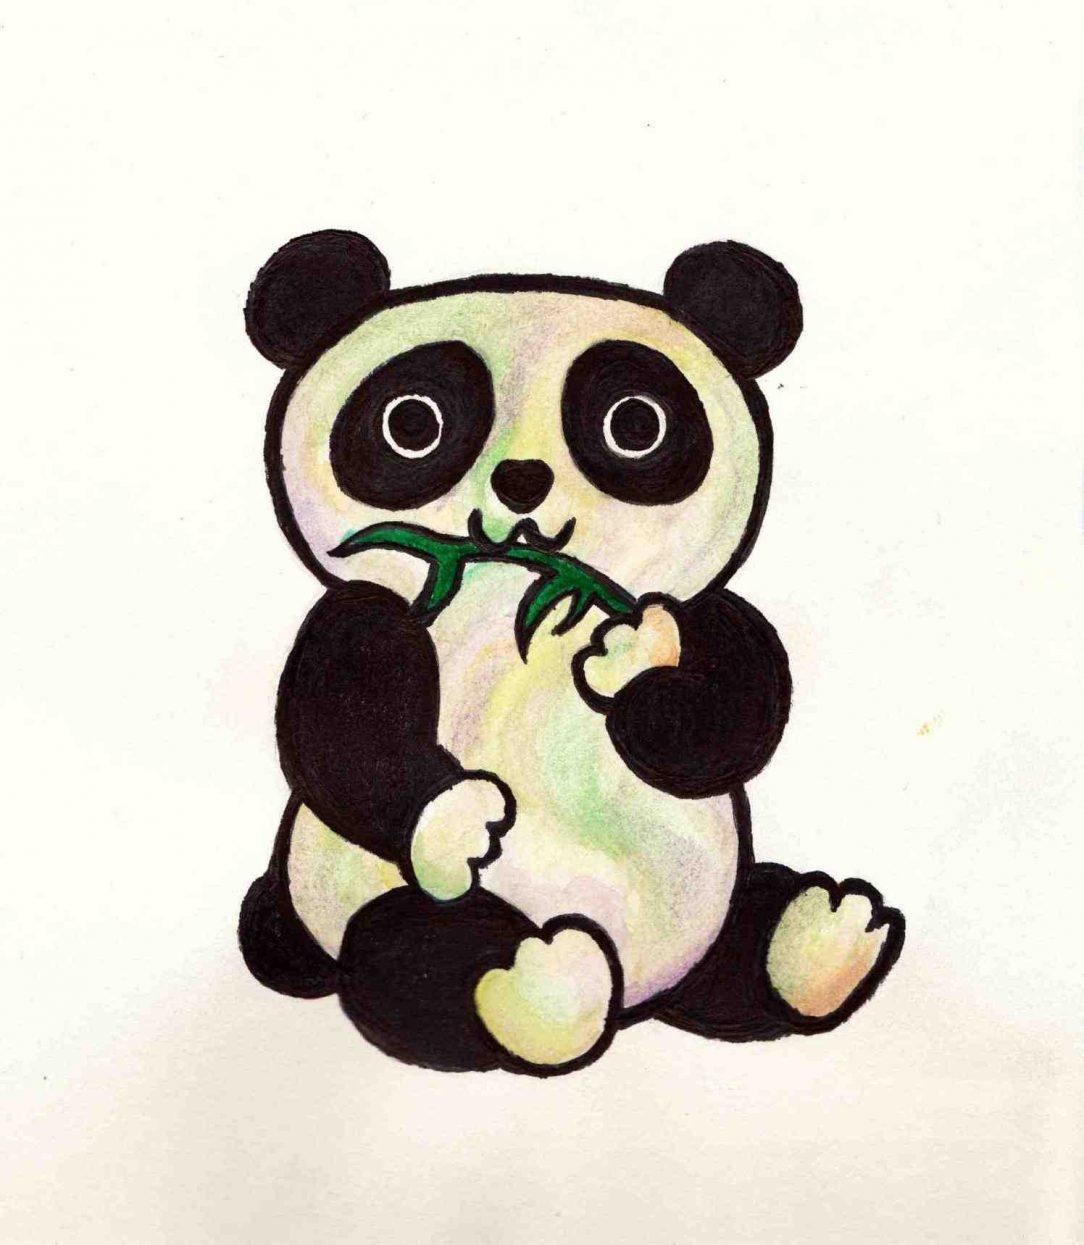 1084x1245 Cute Panda Drawing Wallpaper Baby Pictures Chibi I Fertility